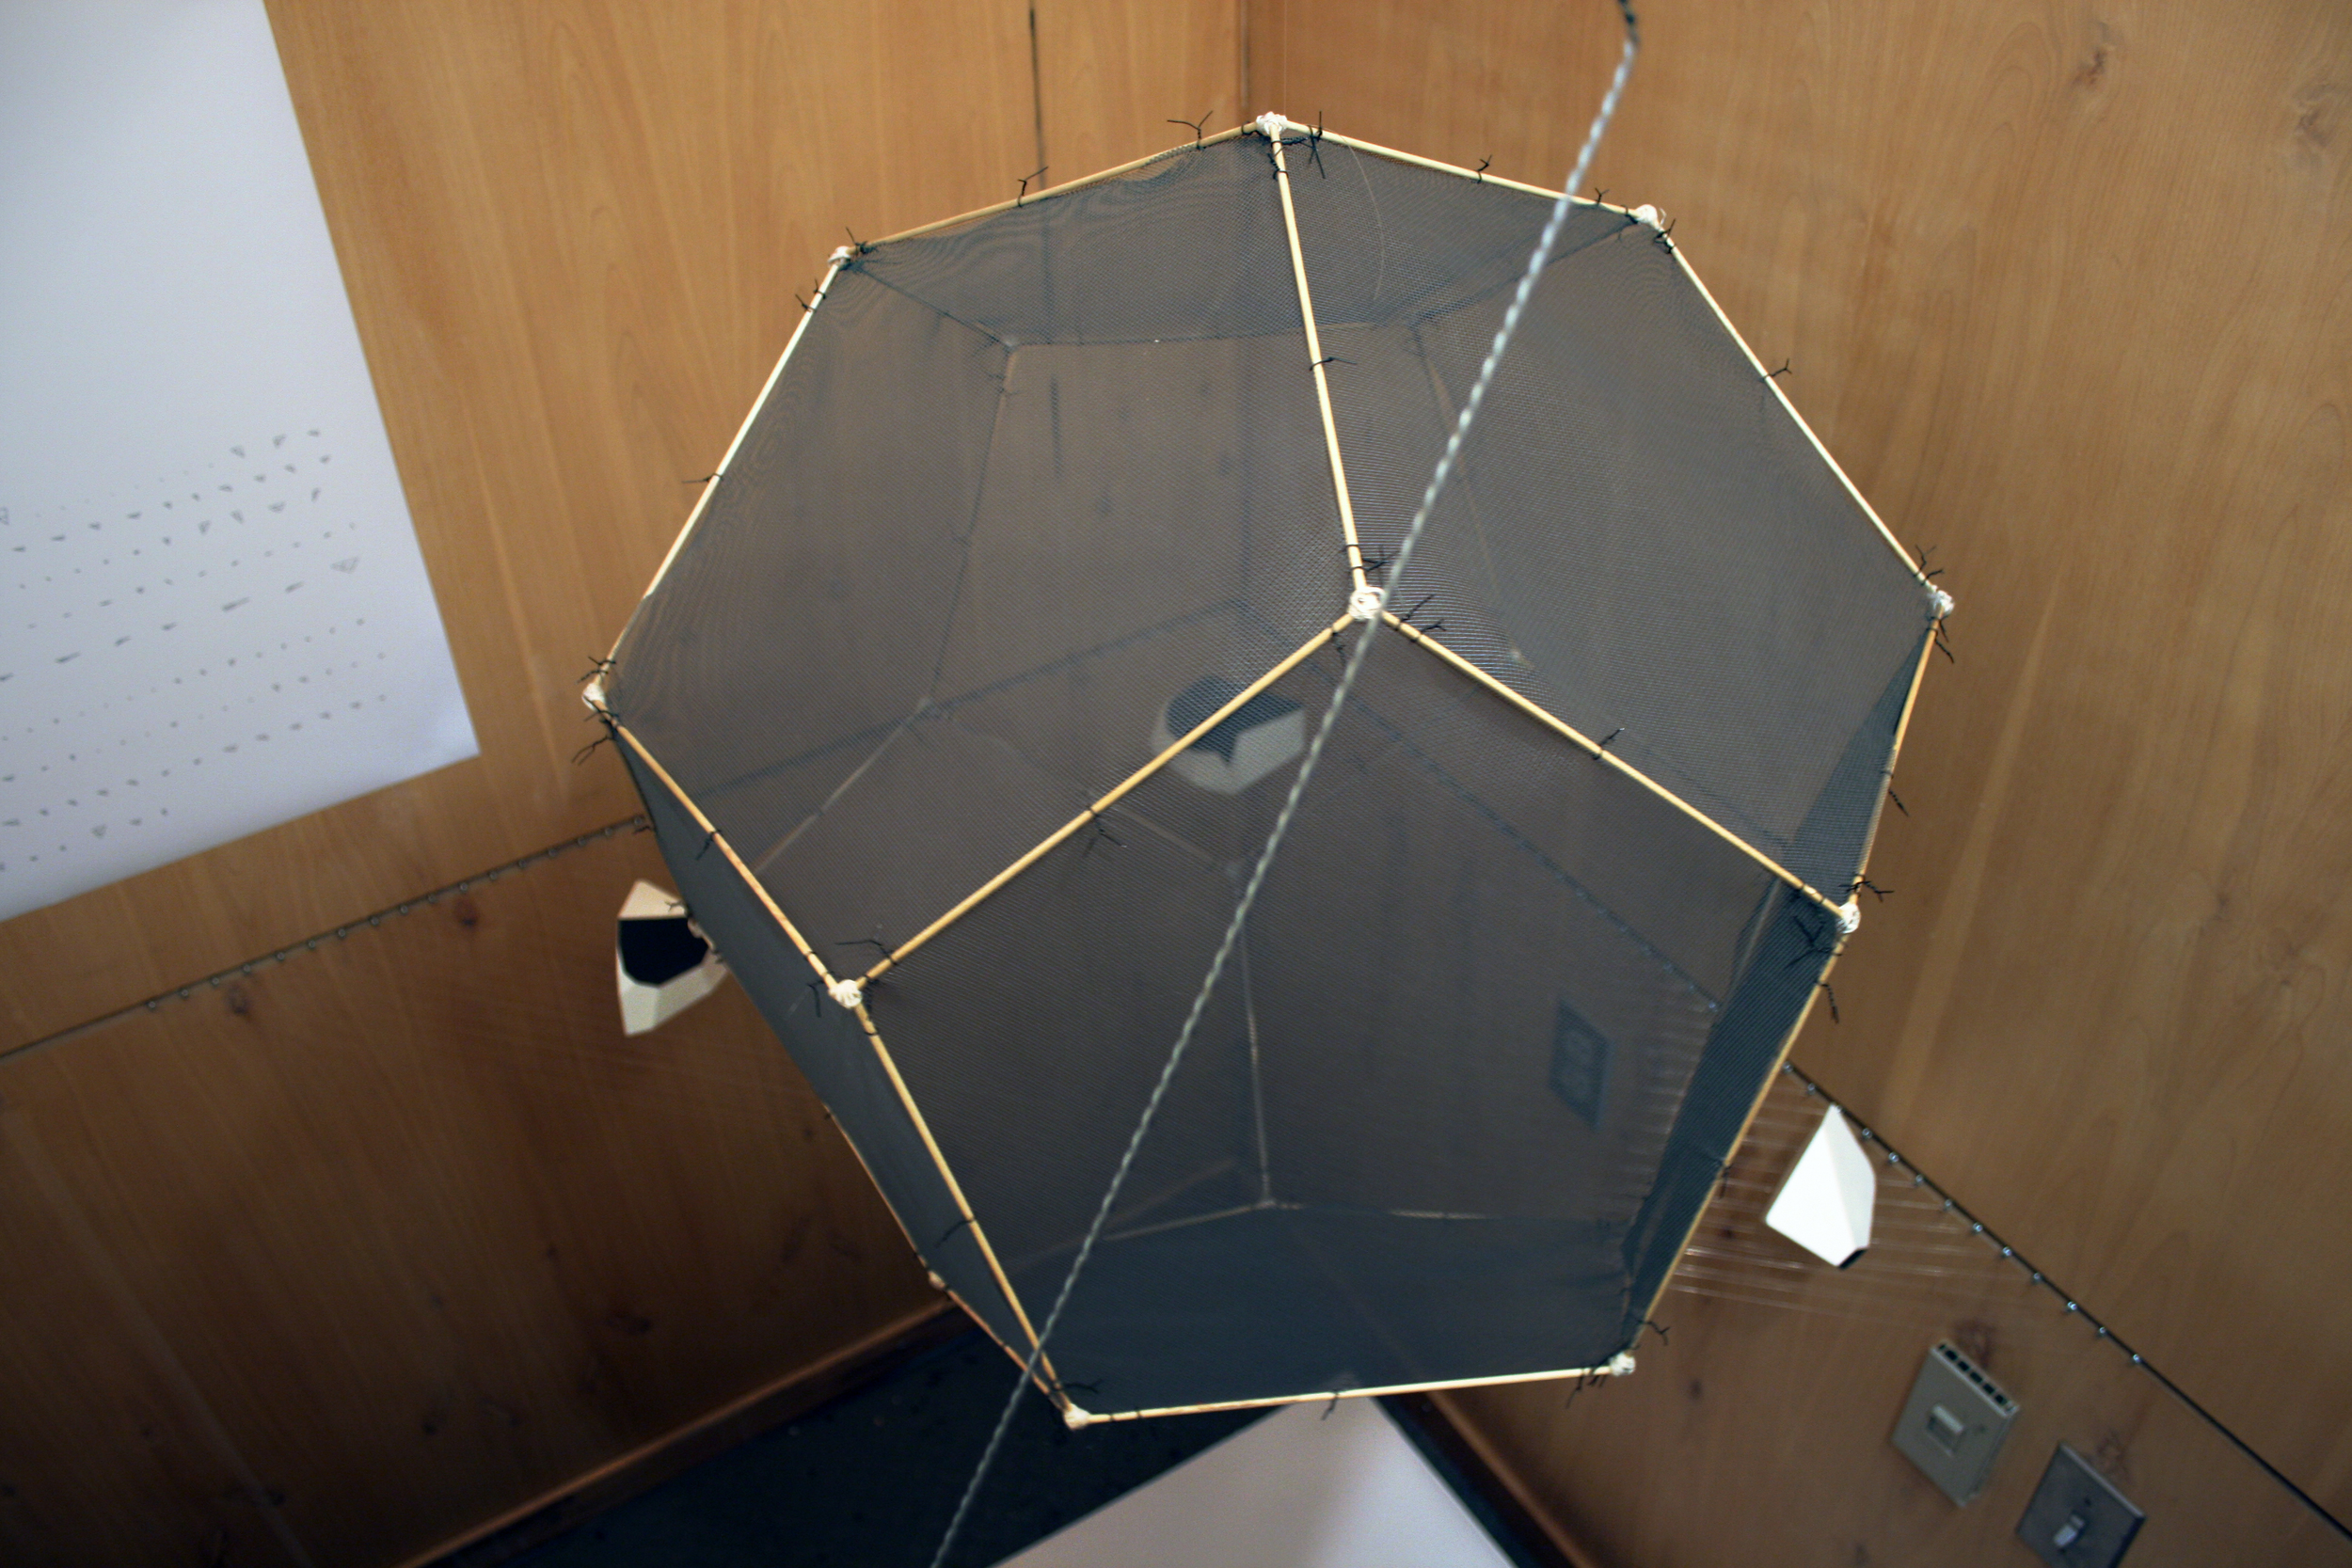 voronoi project workspace.jpg